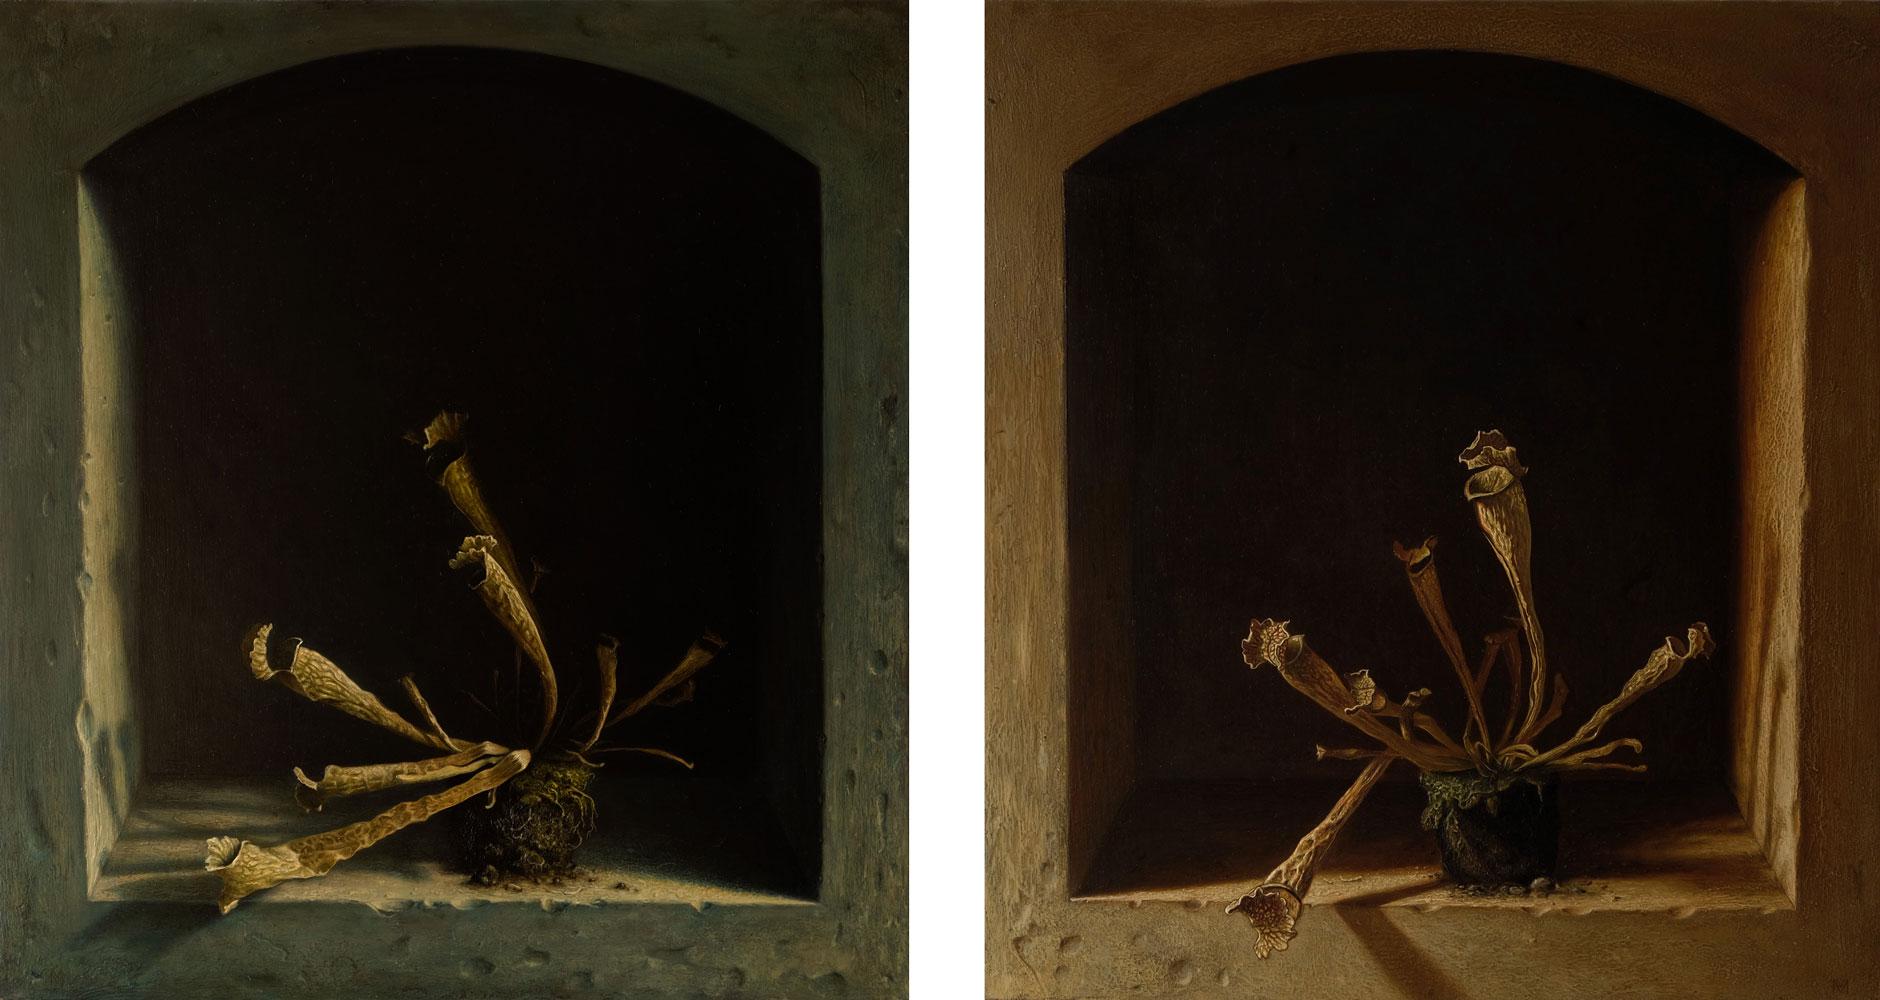 Öl auf Leinwand, 50 cm x 46cm, 2017